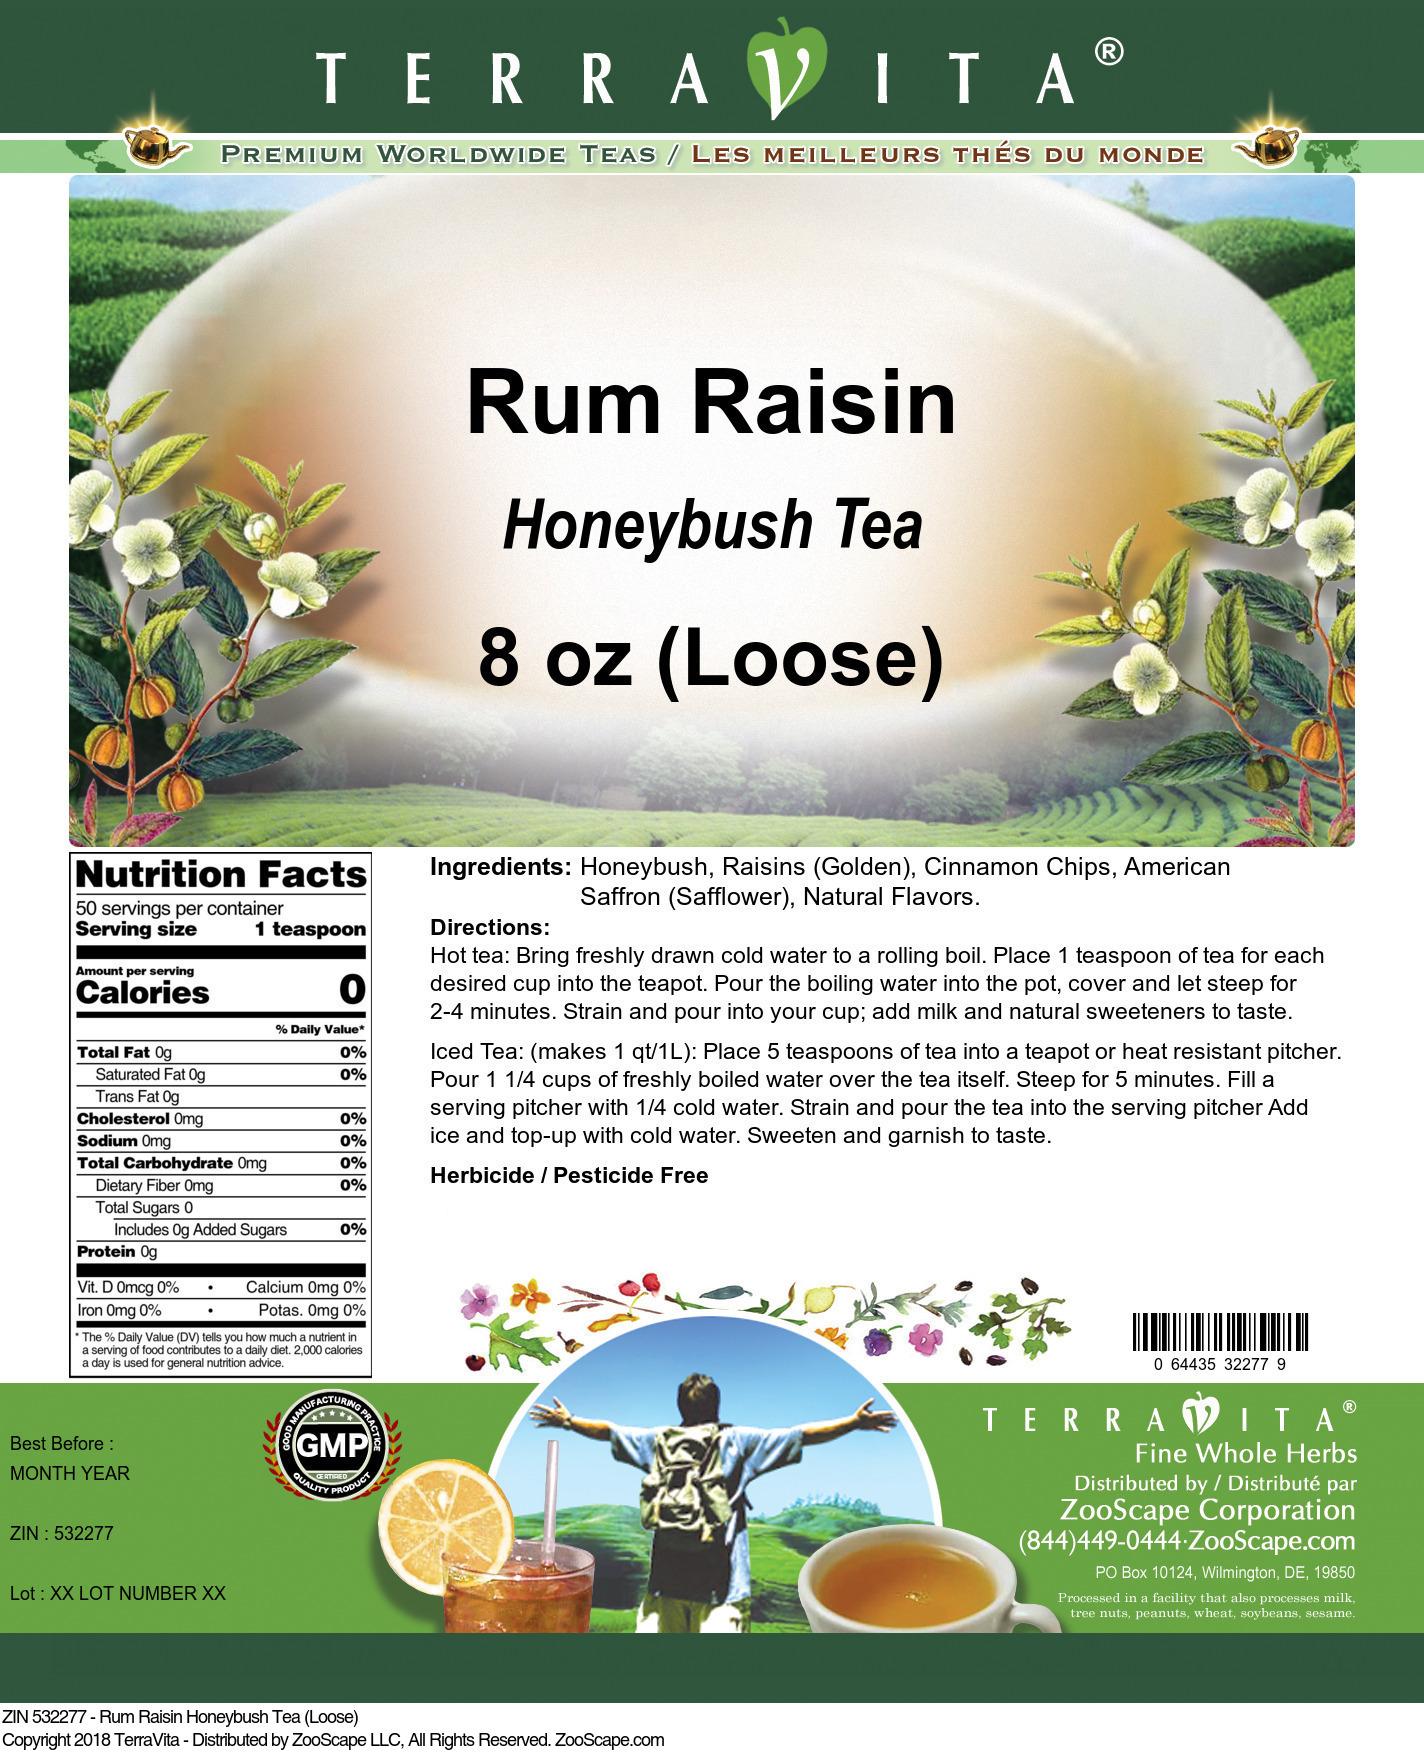 Rum Raisin Honeybush Tea (Loose)